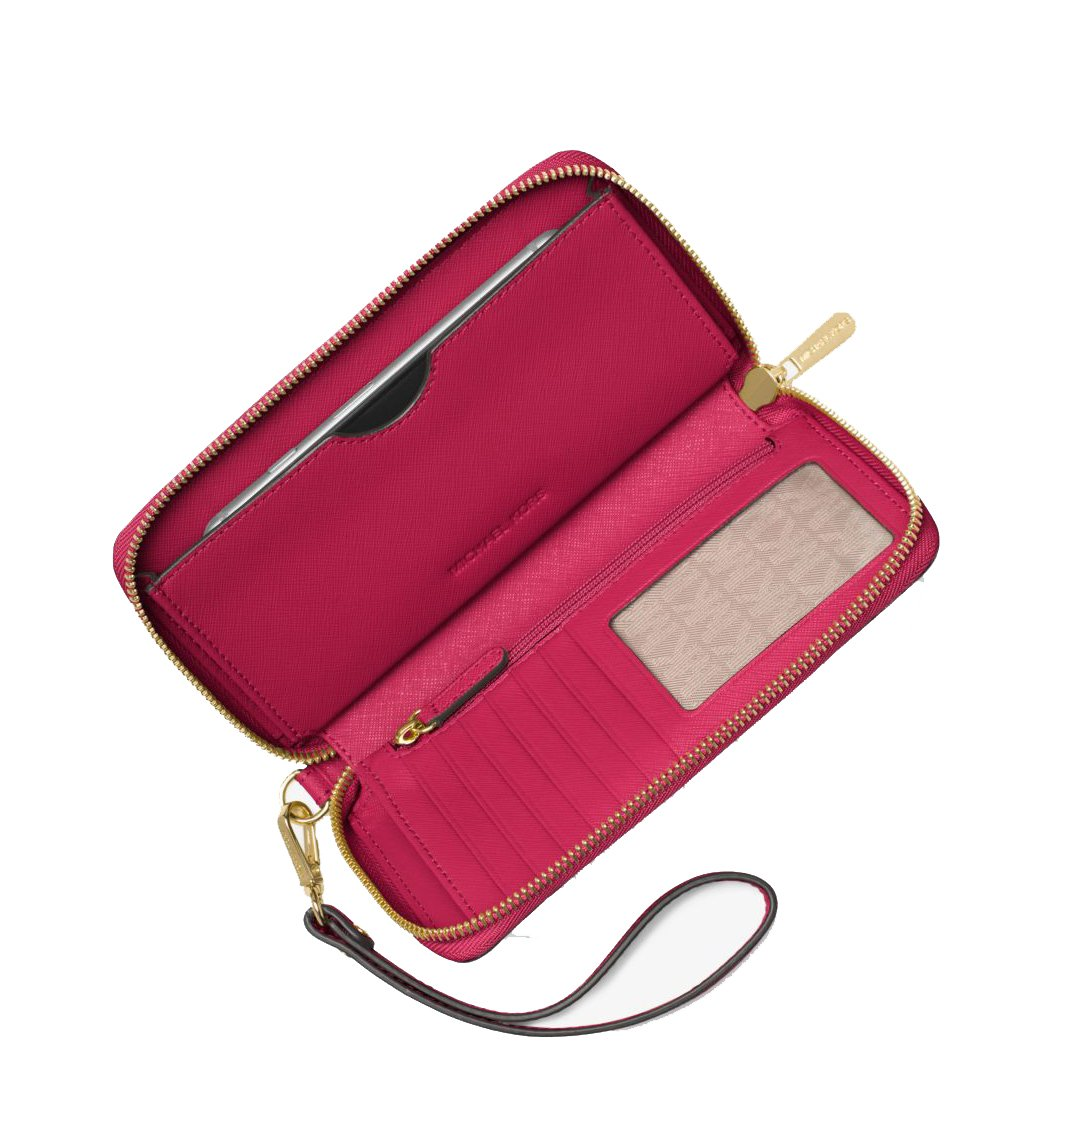 Michael Kors Women's Jet Set Travel Large Smartphone Wristlet (Cranberry) by Michael Kors (Image #2)